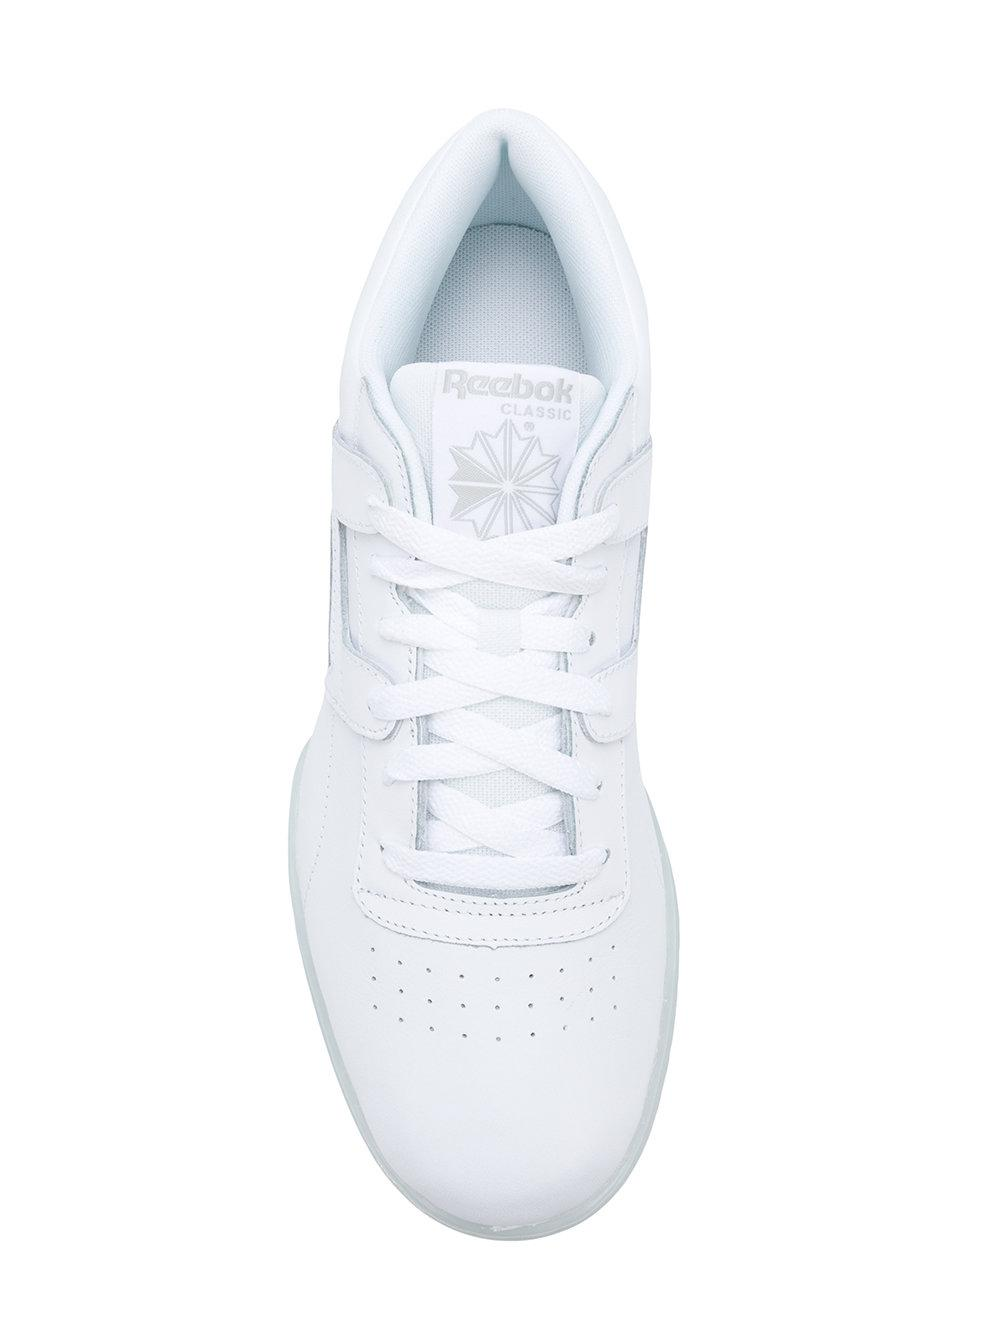 62e3e4877d6 Reebok - White Workout Clean Ripple Sneakers for Men - Lyst. View fullscreen